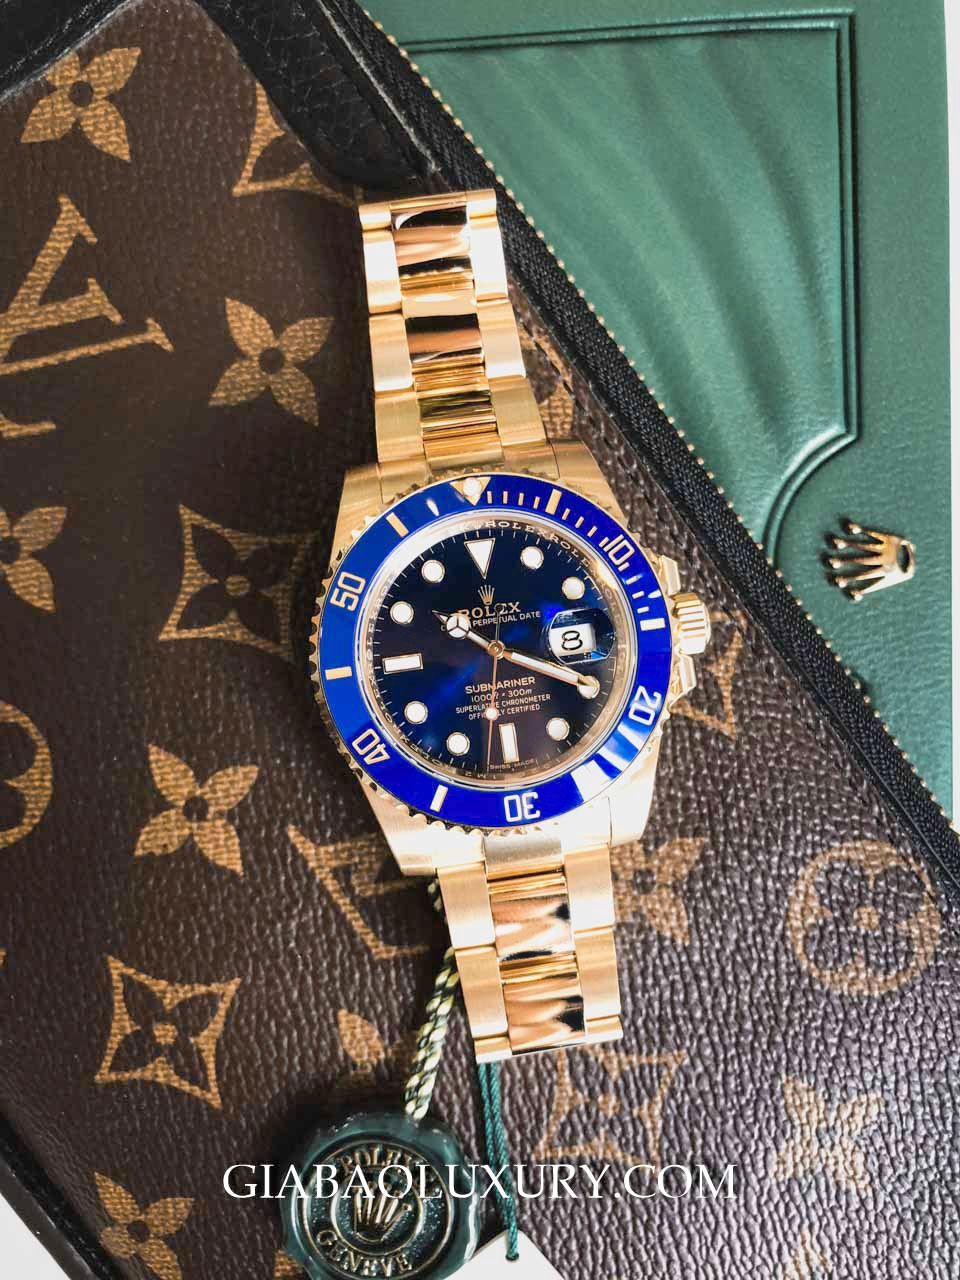 Rolex Submariner Date 116618LB Mặt xanh navy